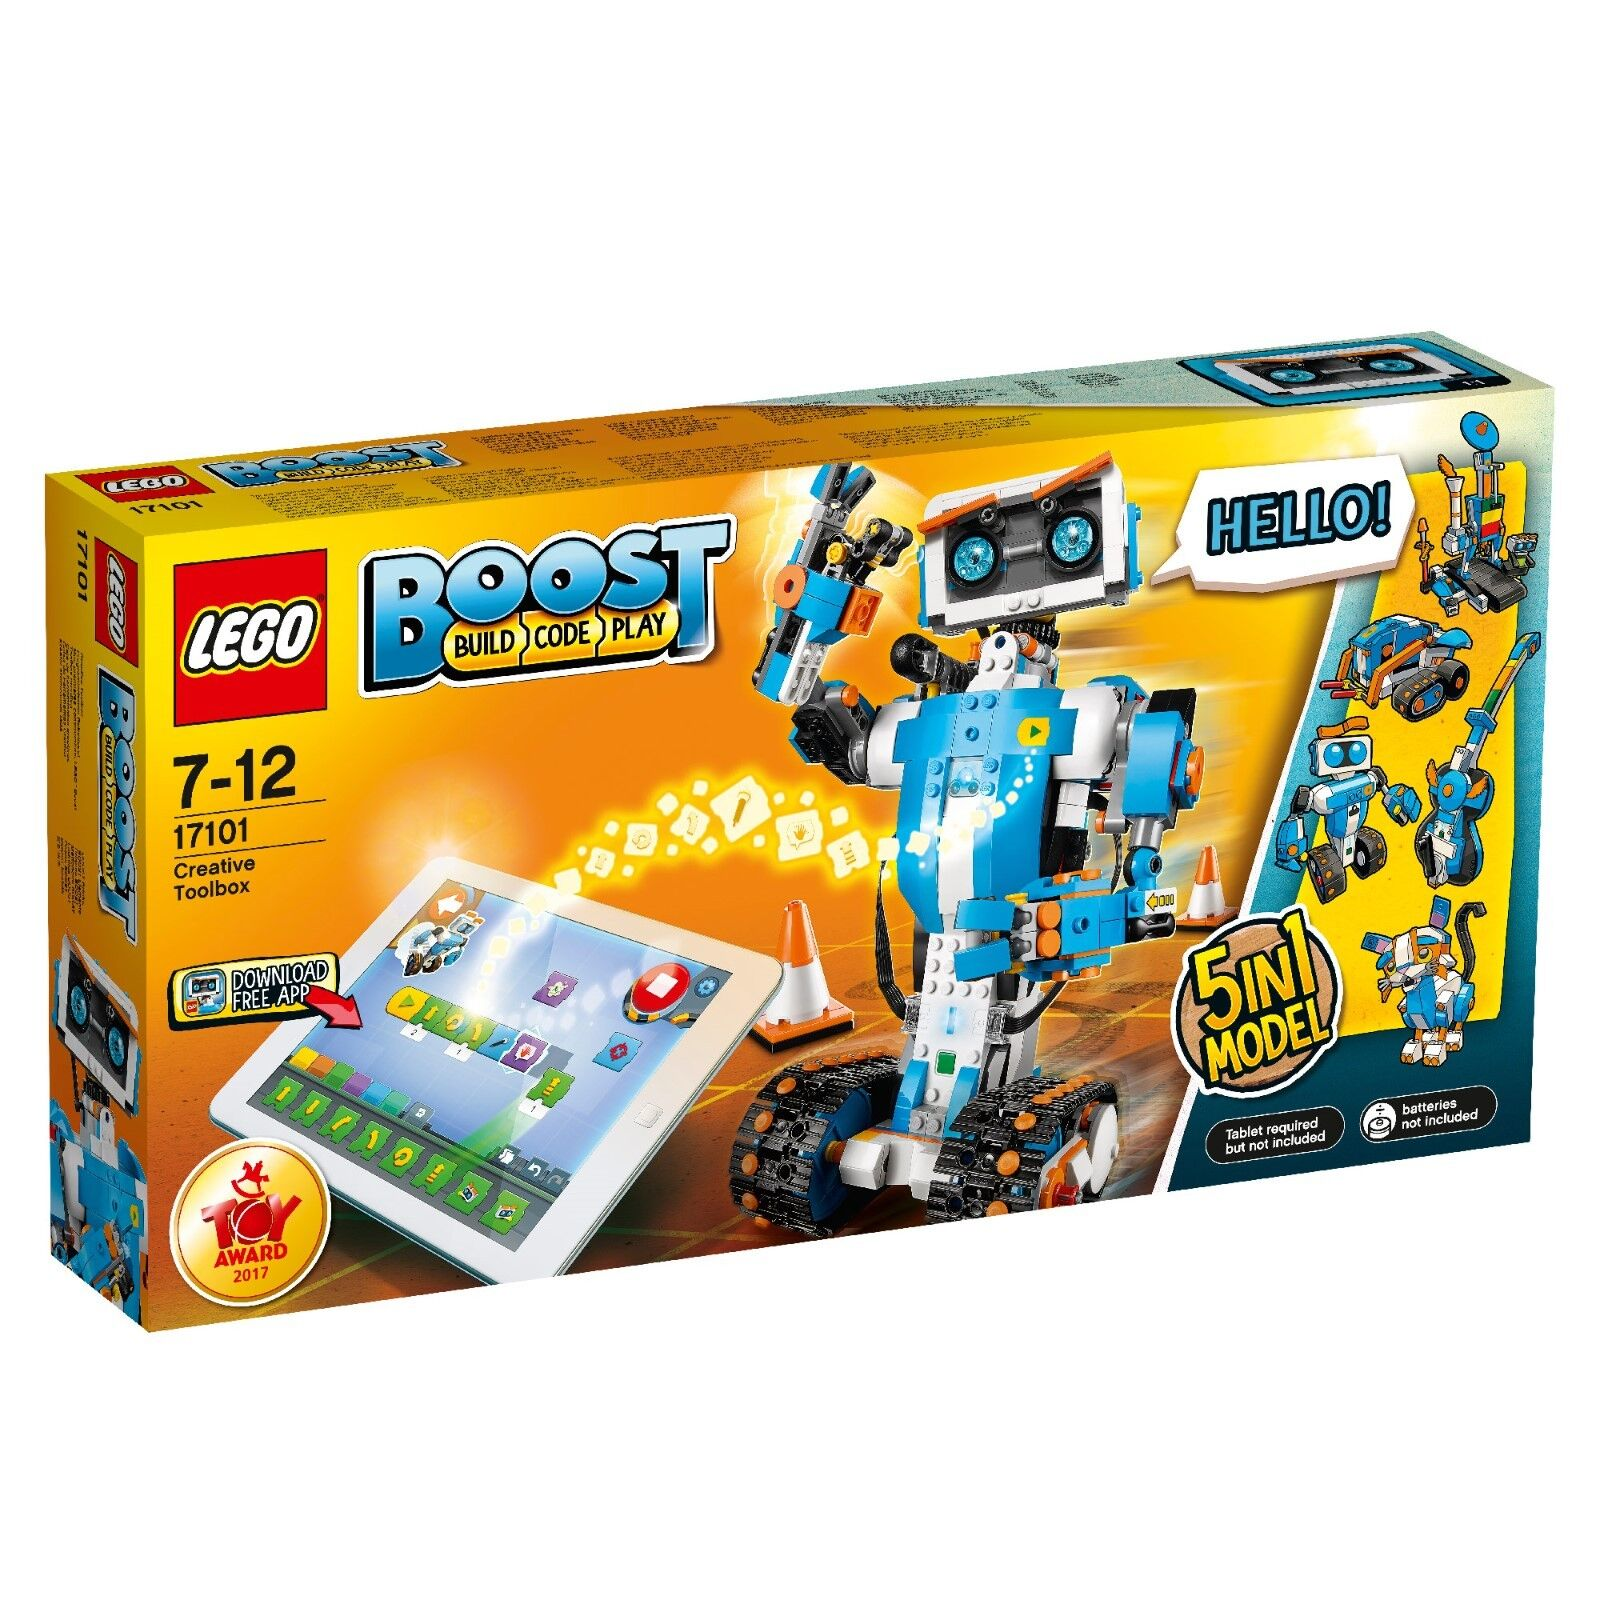 LEGO 17101 creativa wergzeugkasten elementi costitutivi, colorato